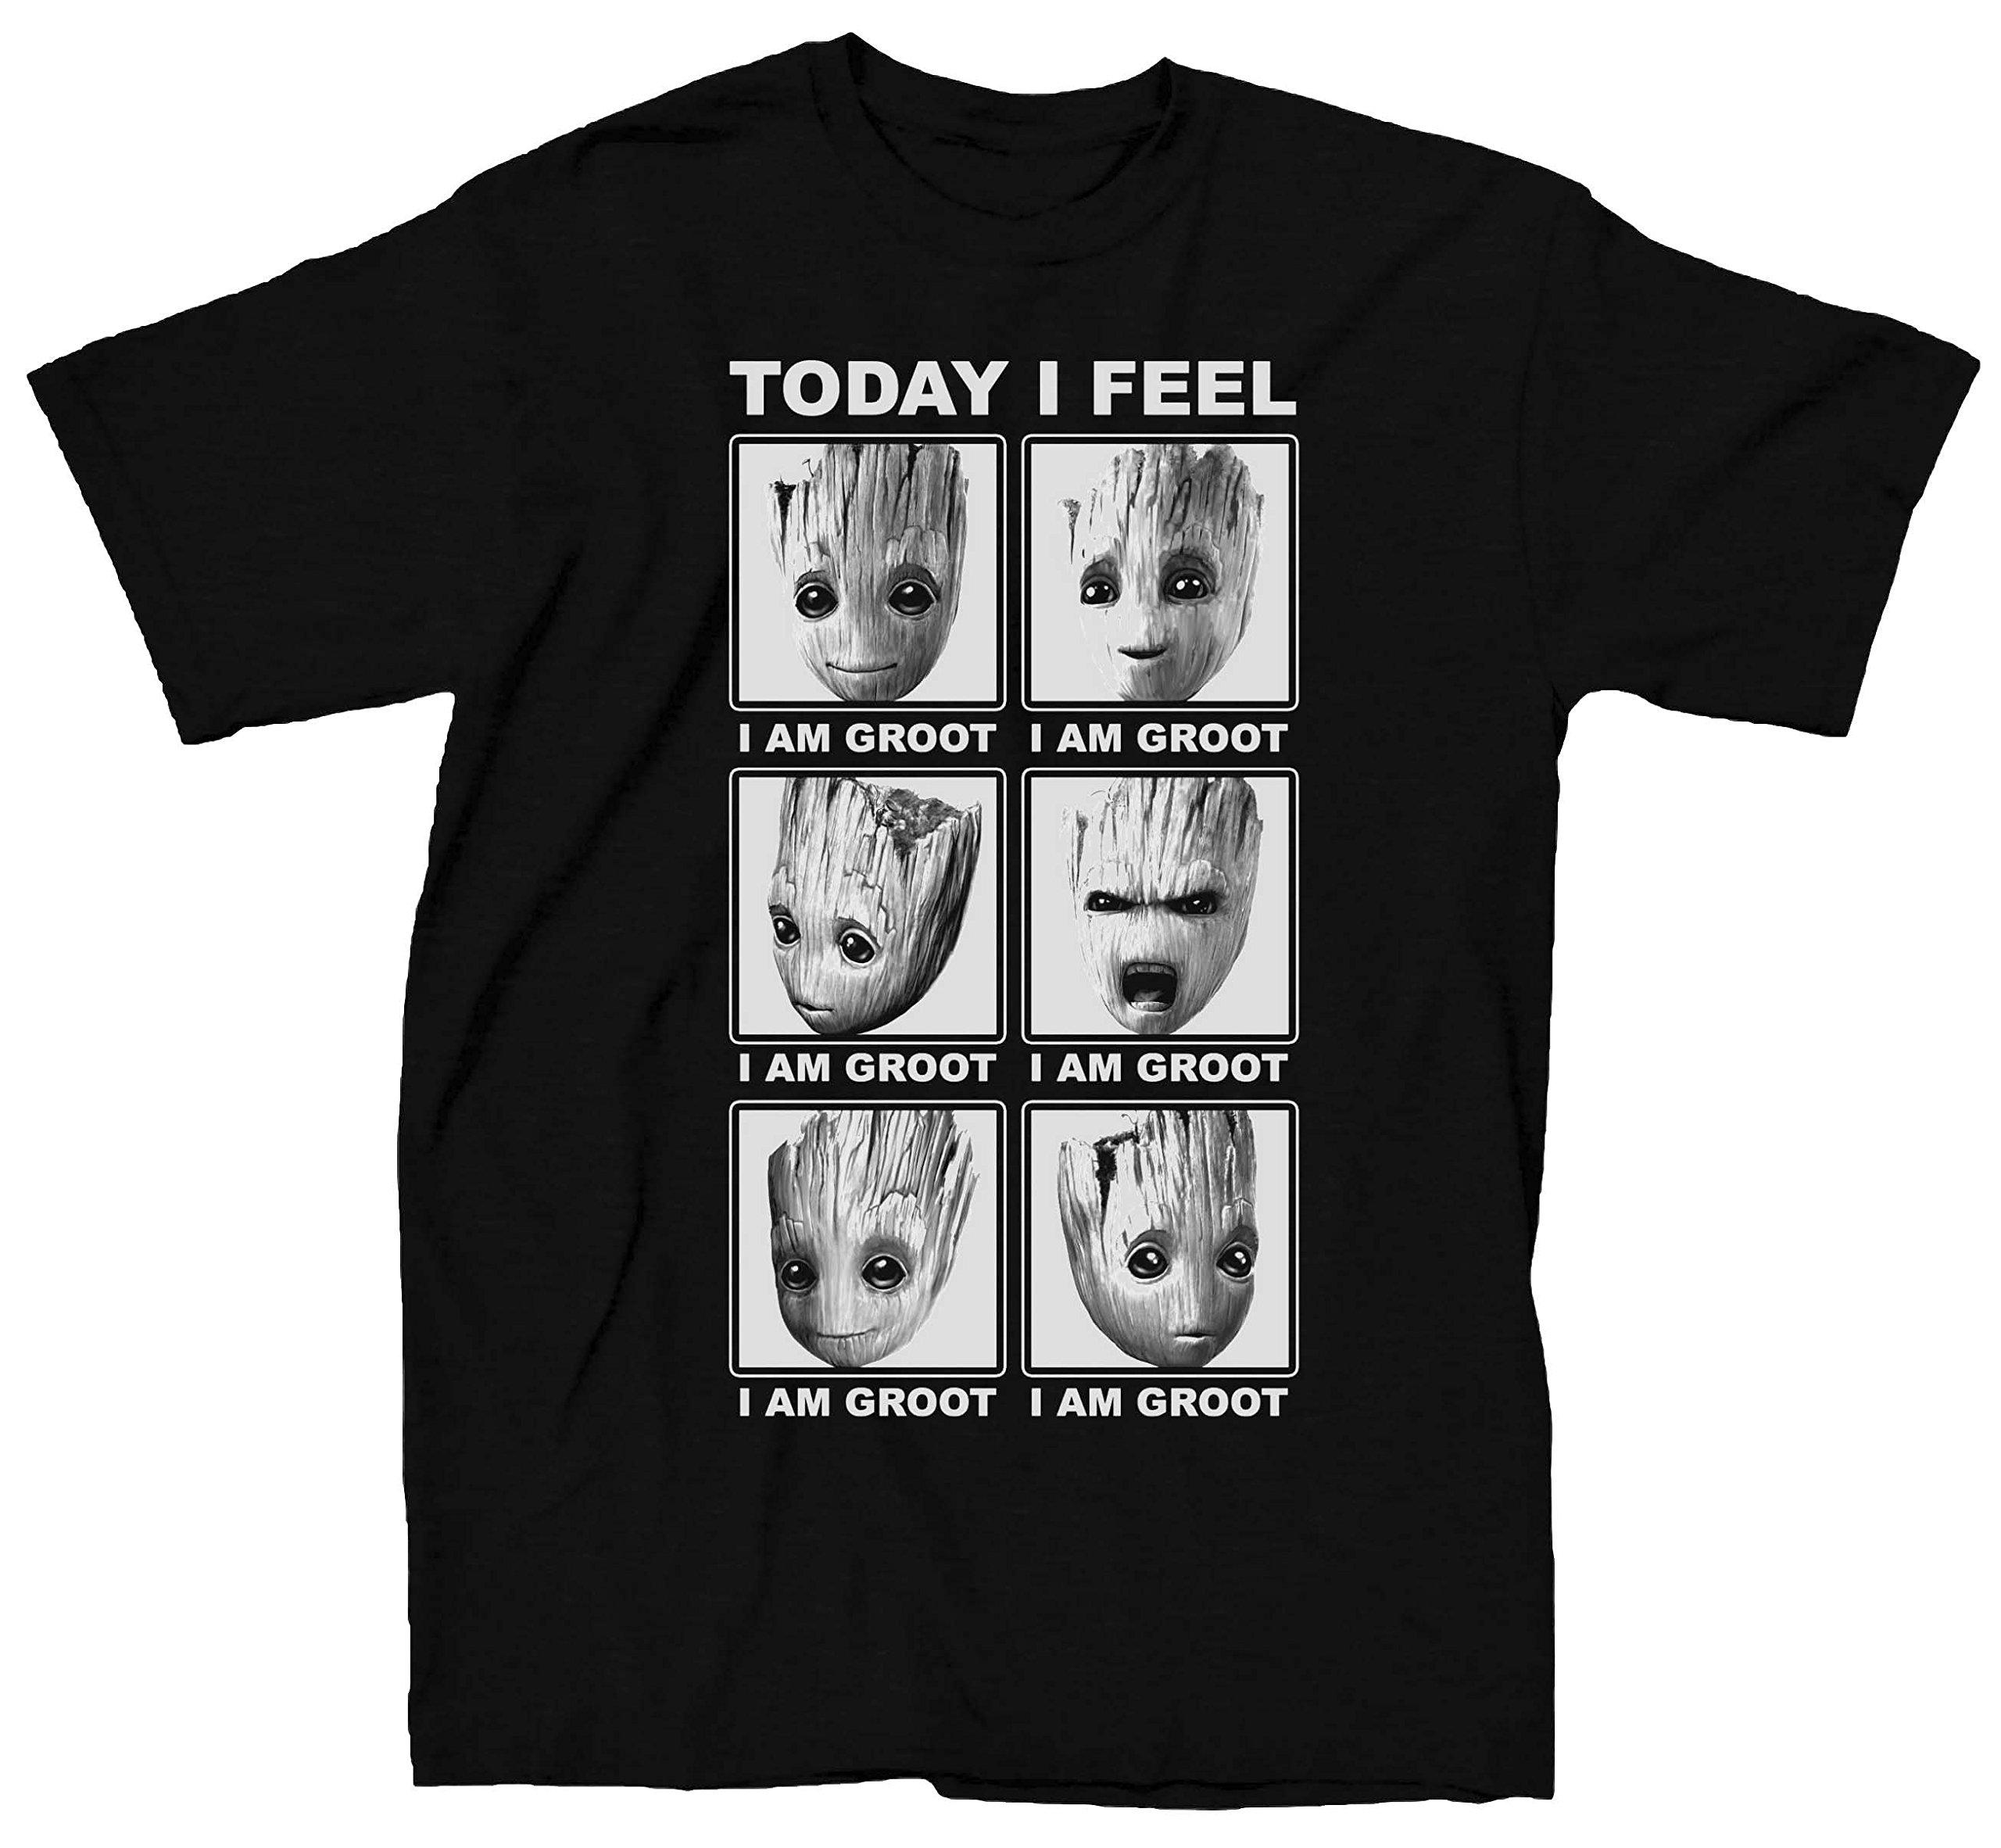 Marvel Guardians Of The Galaxy 2 Face Of Groot I Feel T-shirt (Medium, Heather Black)